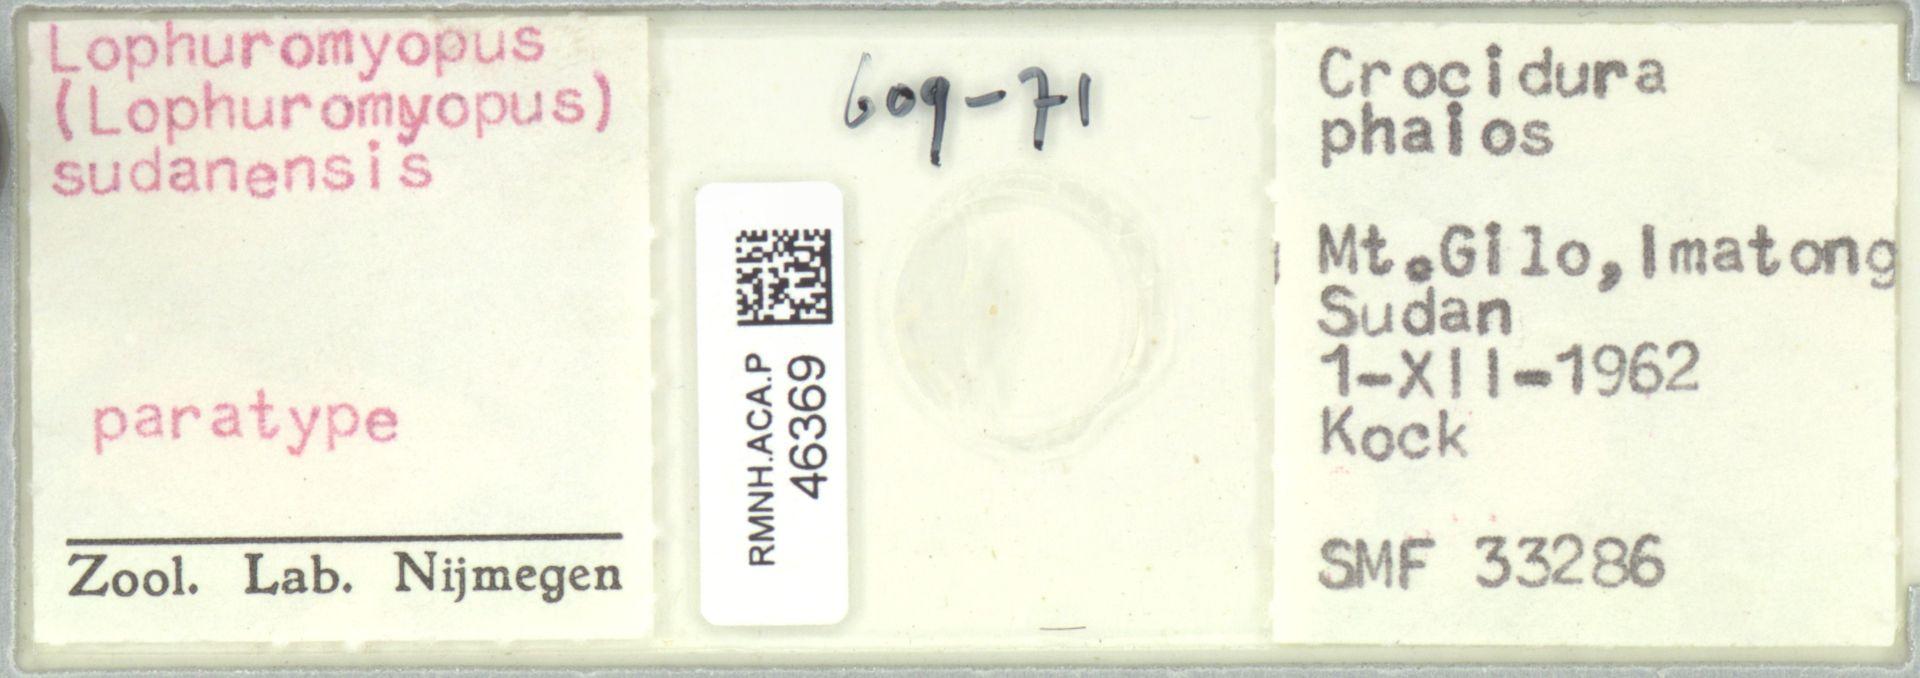 RMNH.ACA.P.46369 | Lophuromyopus (Lophuromyopus) sudanensis